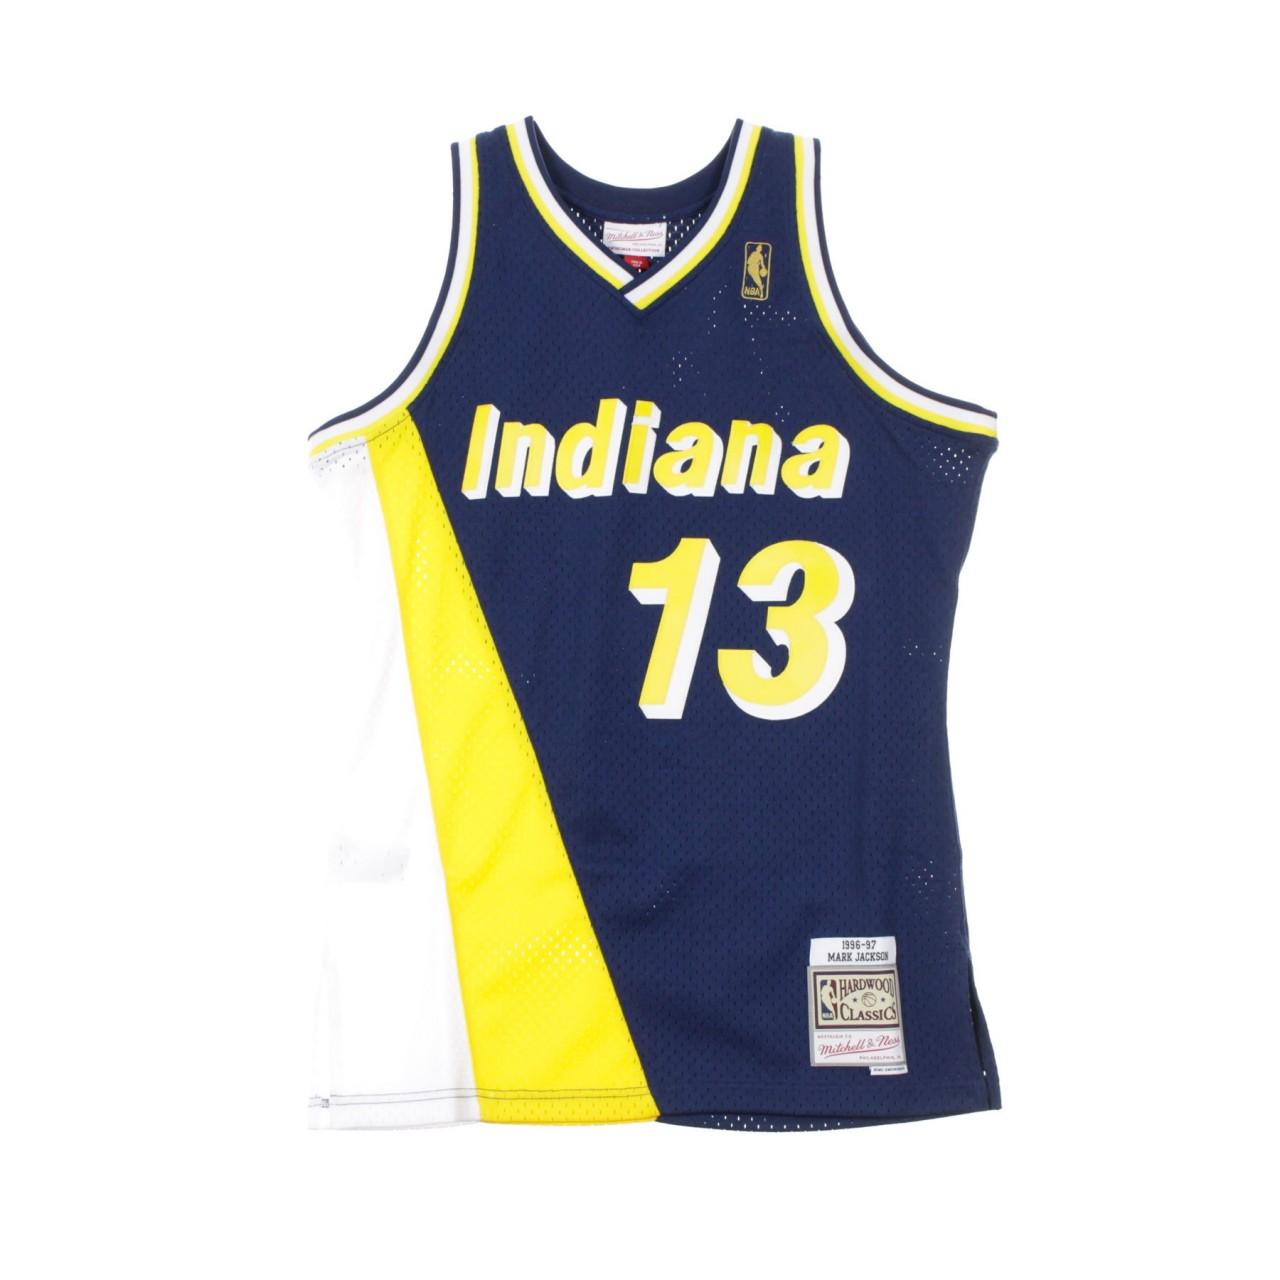 MITCHELL & NESS NBA SWINGMAN JERSEY MARK JACKSON NO.13 1996-97 INDPAC ROAD BA84V6-IPA-B-CB3